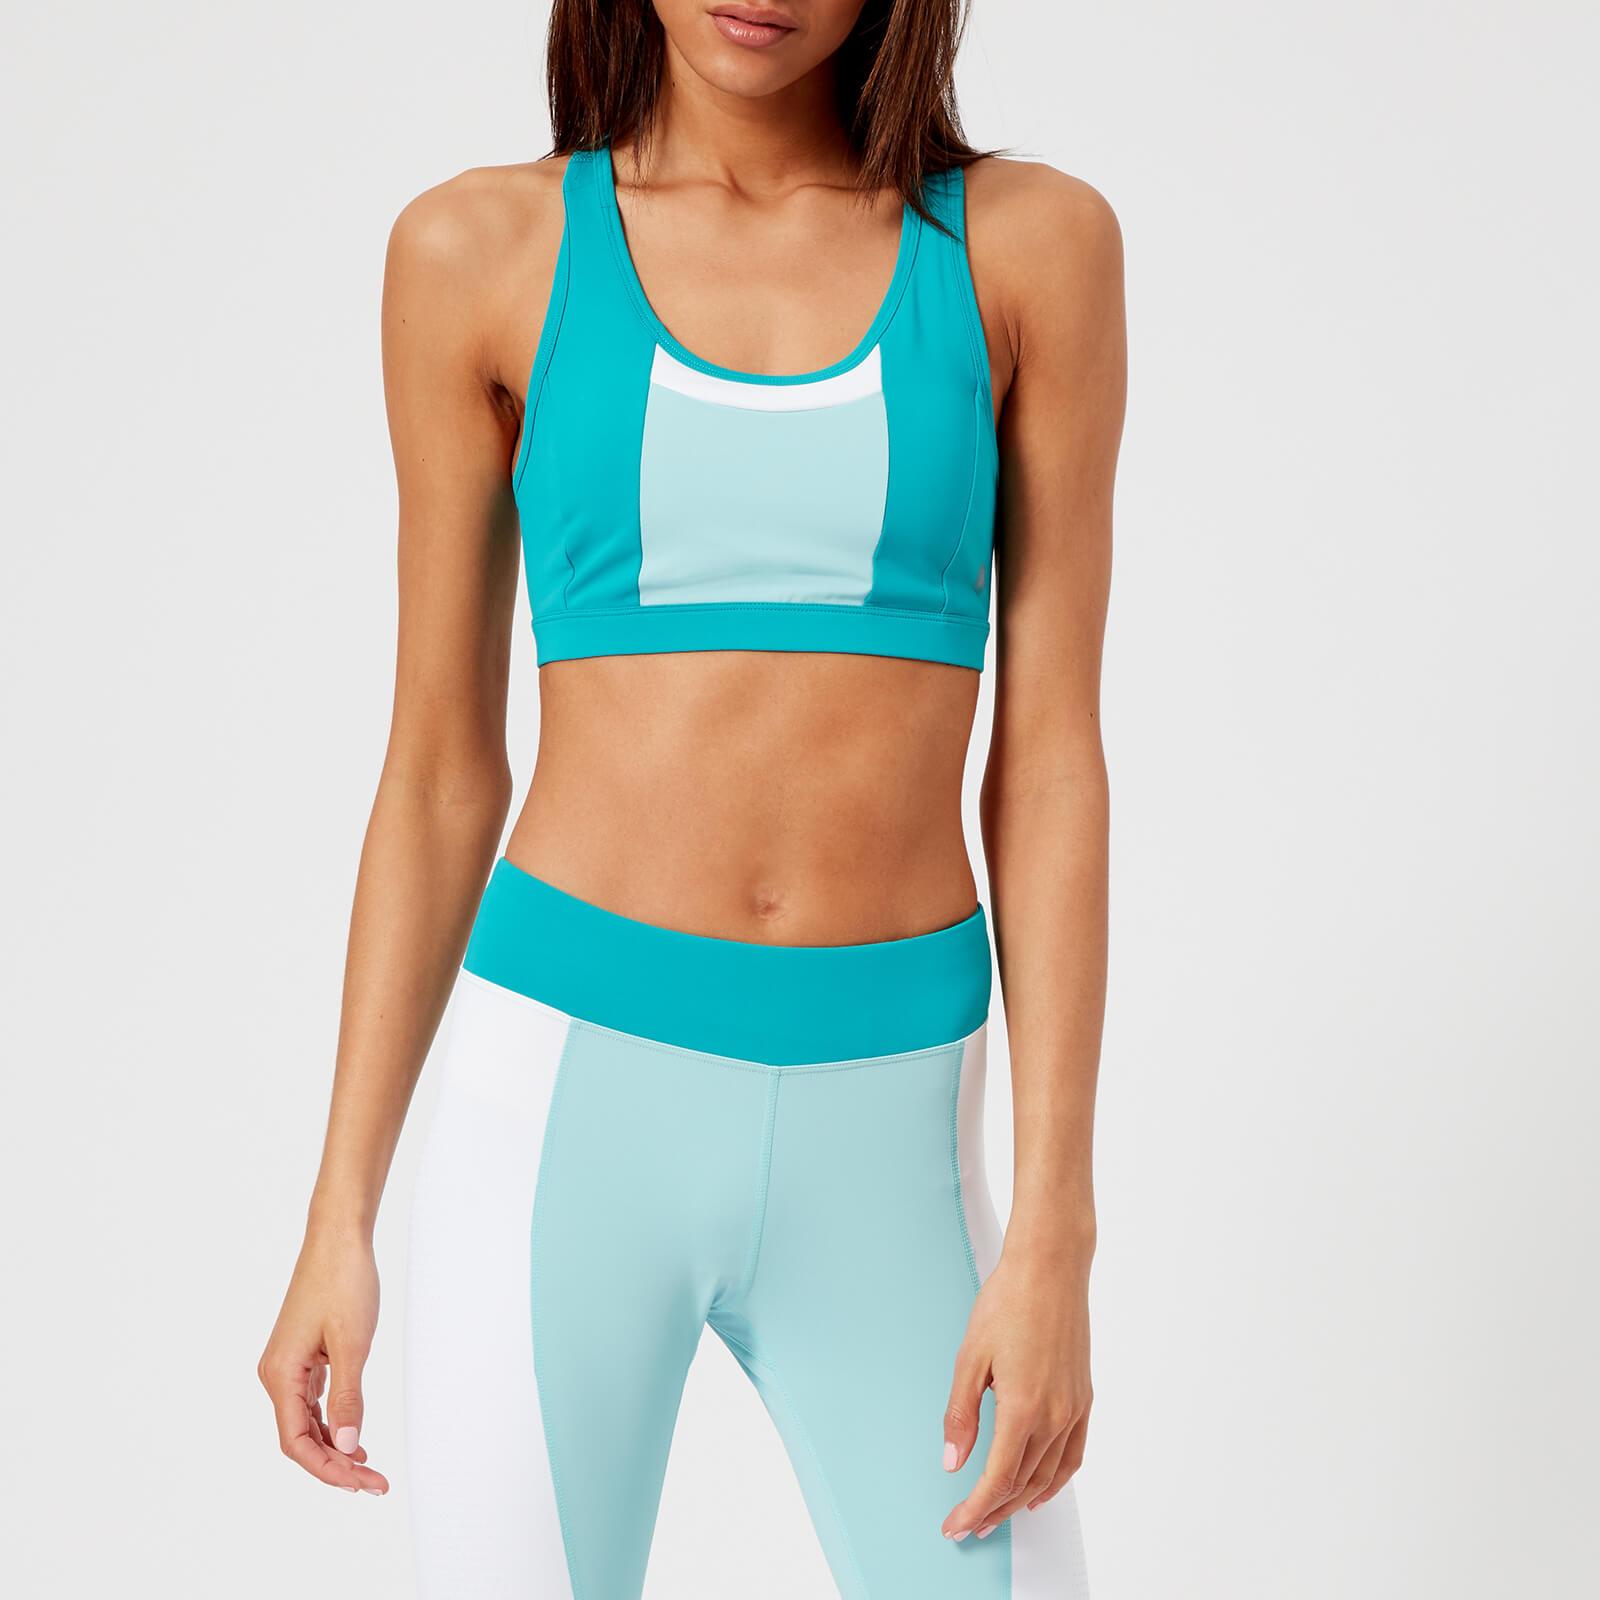 a442363b4a4c Asics Running Women s Colour Block Bra - Lake Blue